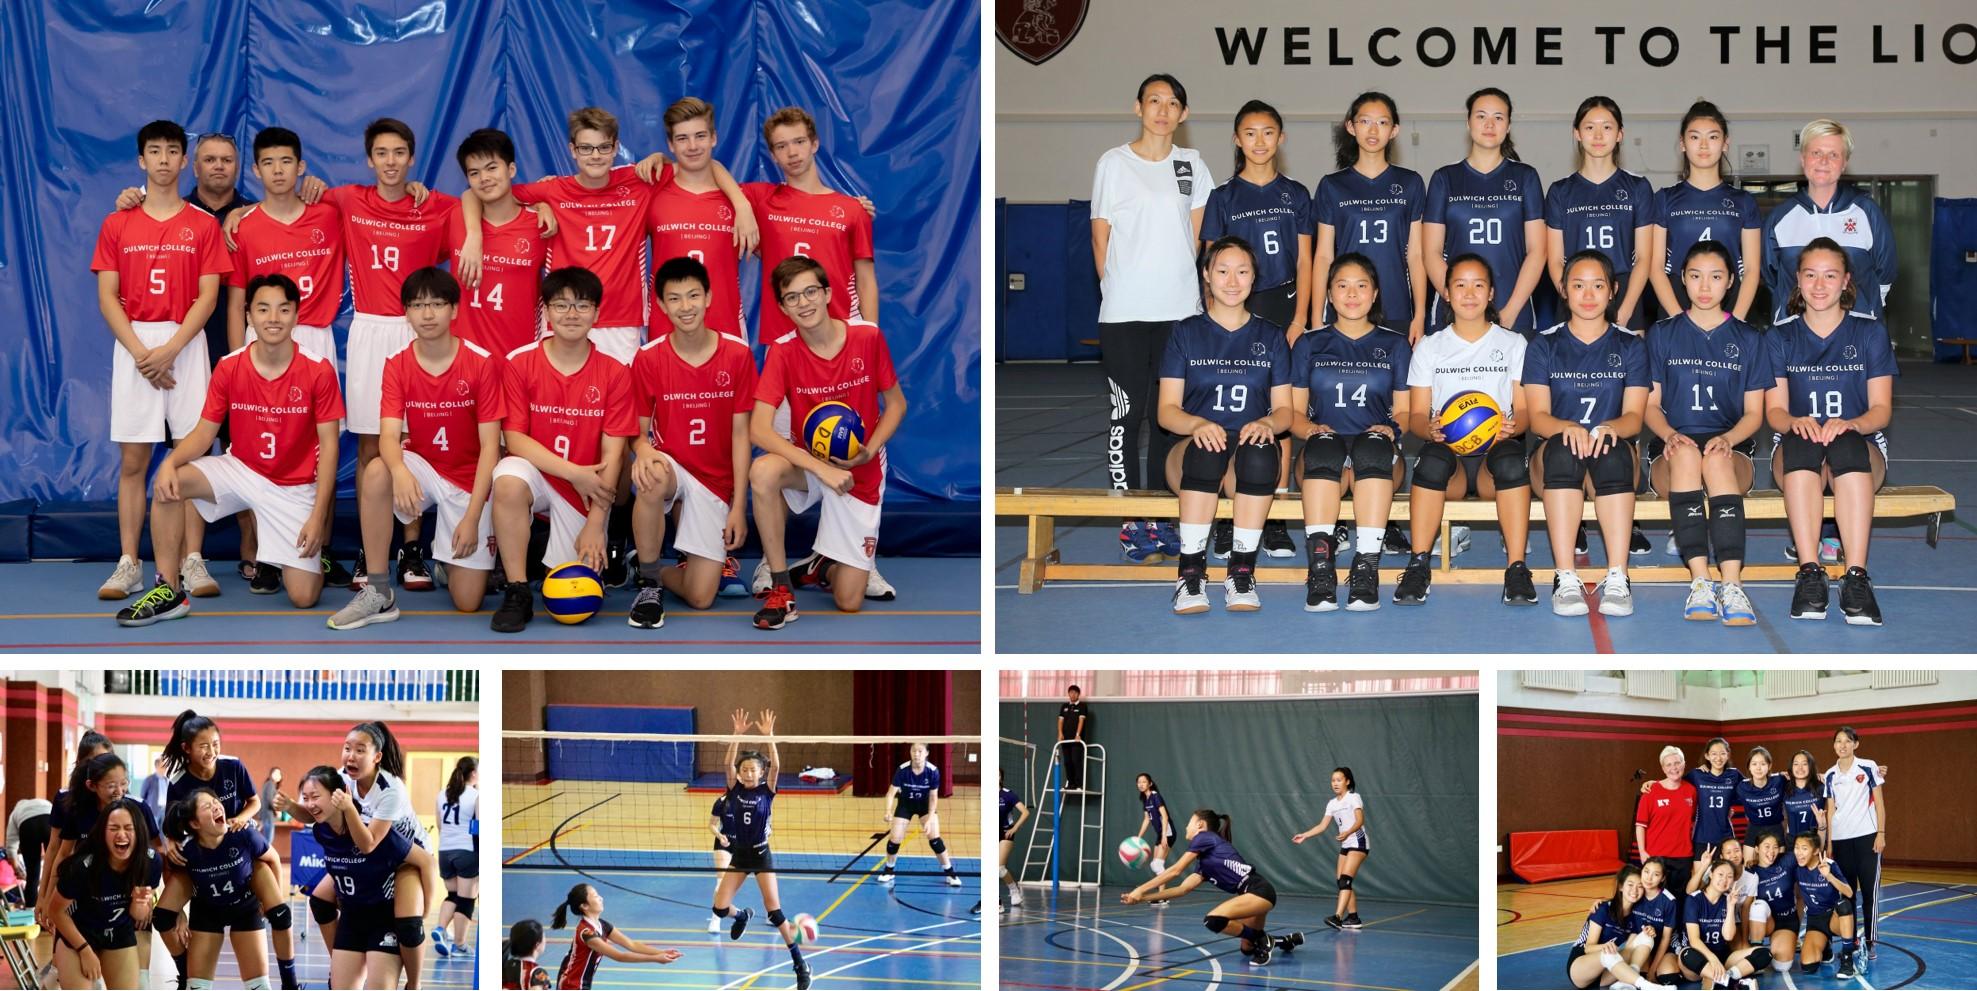 u19-isac-volleyball-tournaments-dcb-varsity-girls-and-jv-boys